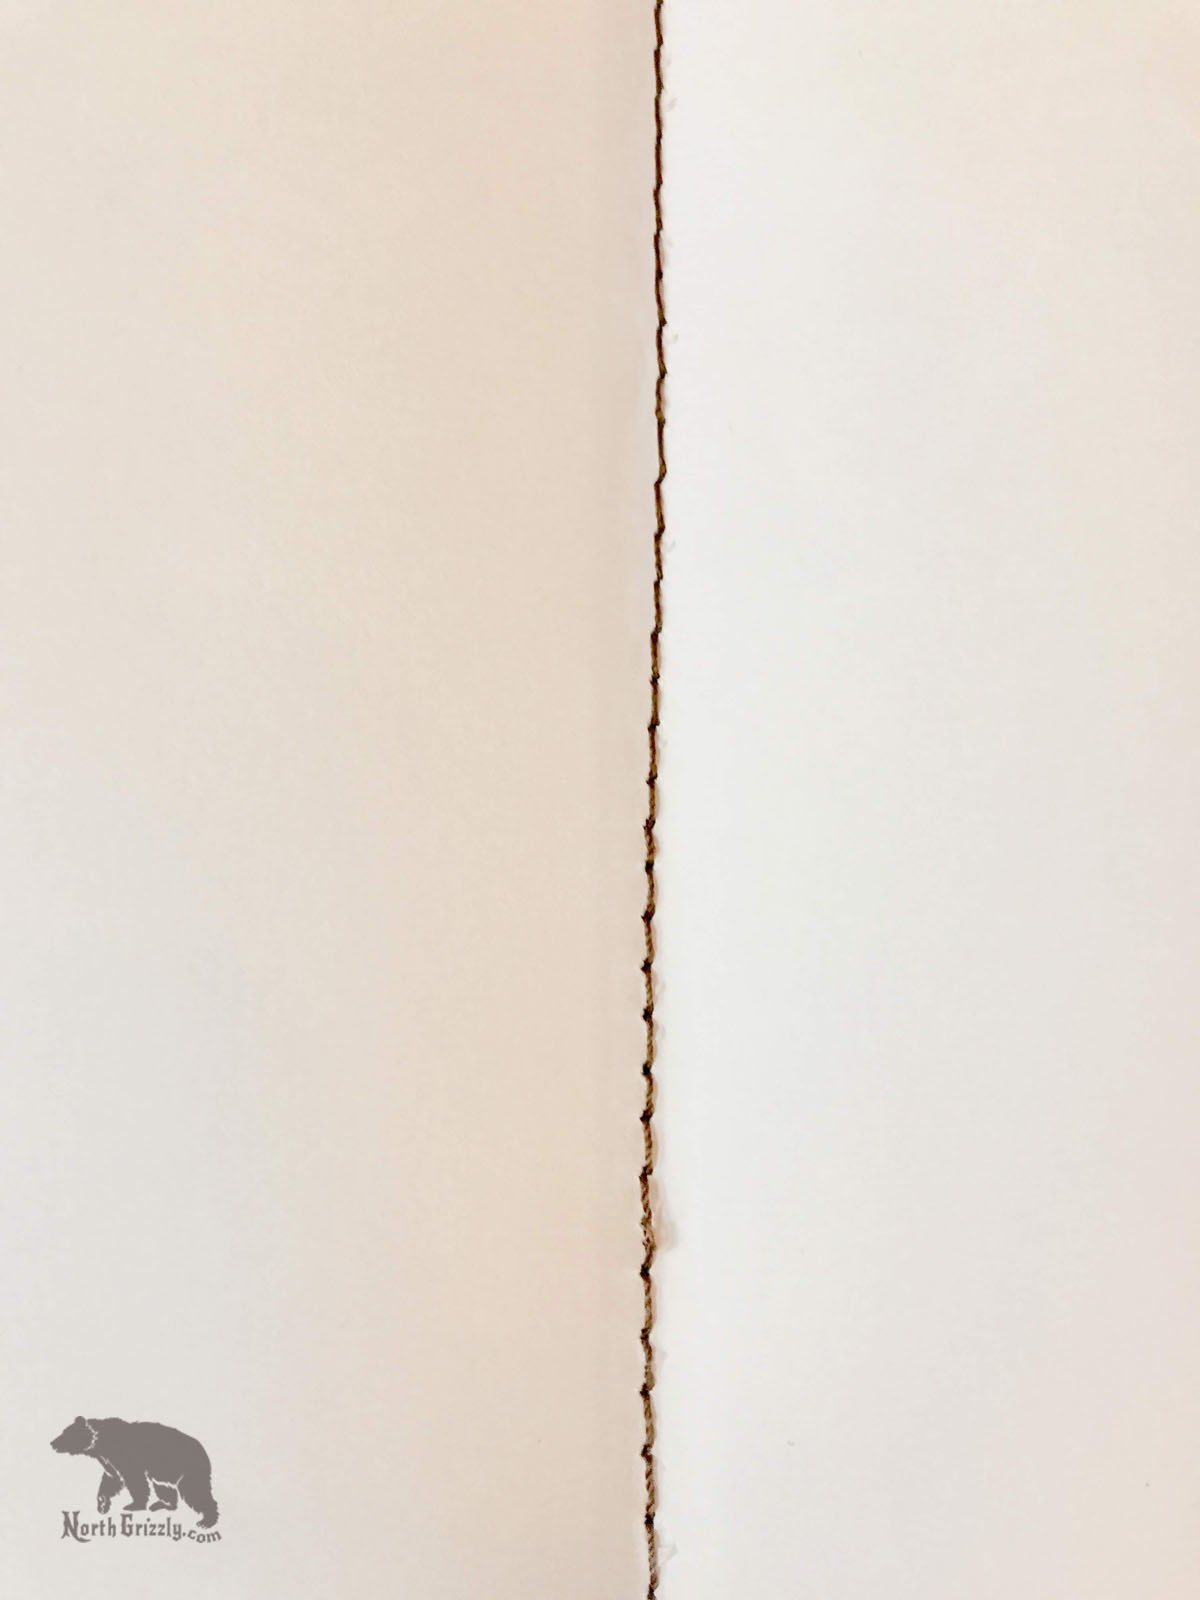 uzrasines baltas  popierius   dienorasciu popierius stechbook baltas popierius balti lapai knyga baltu popieriumi 3